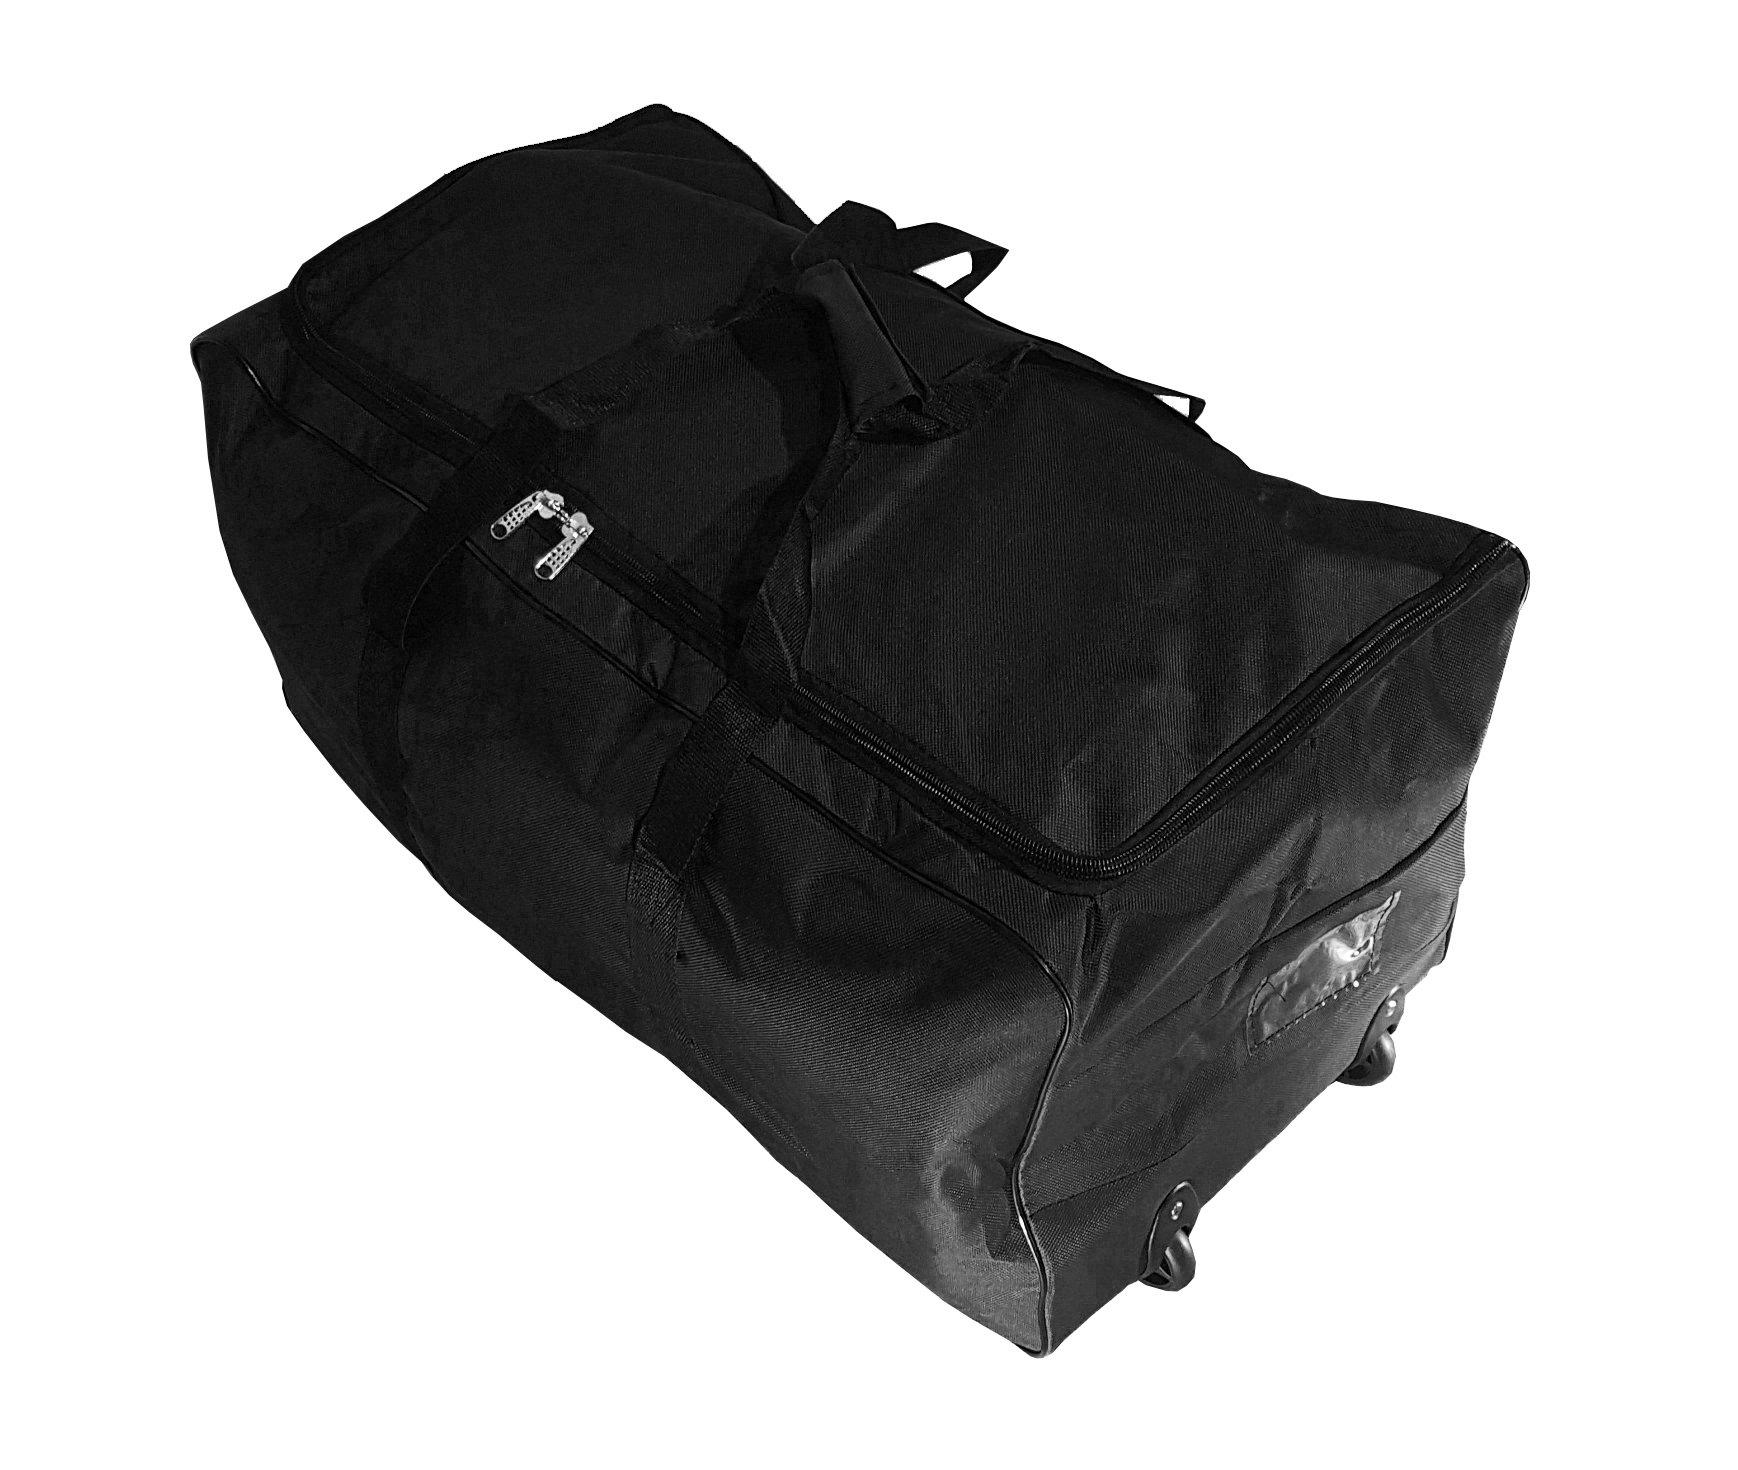 3bb3d07e5 Bolsa de viaje deportes maleta trolley grande 140L con ruedas. Talla XXL.  Negro